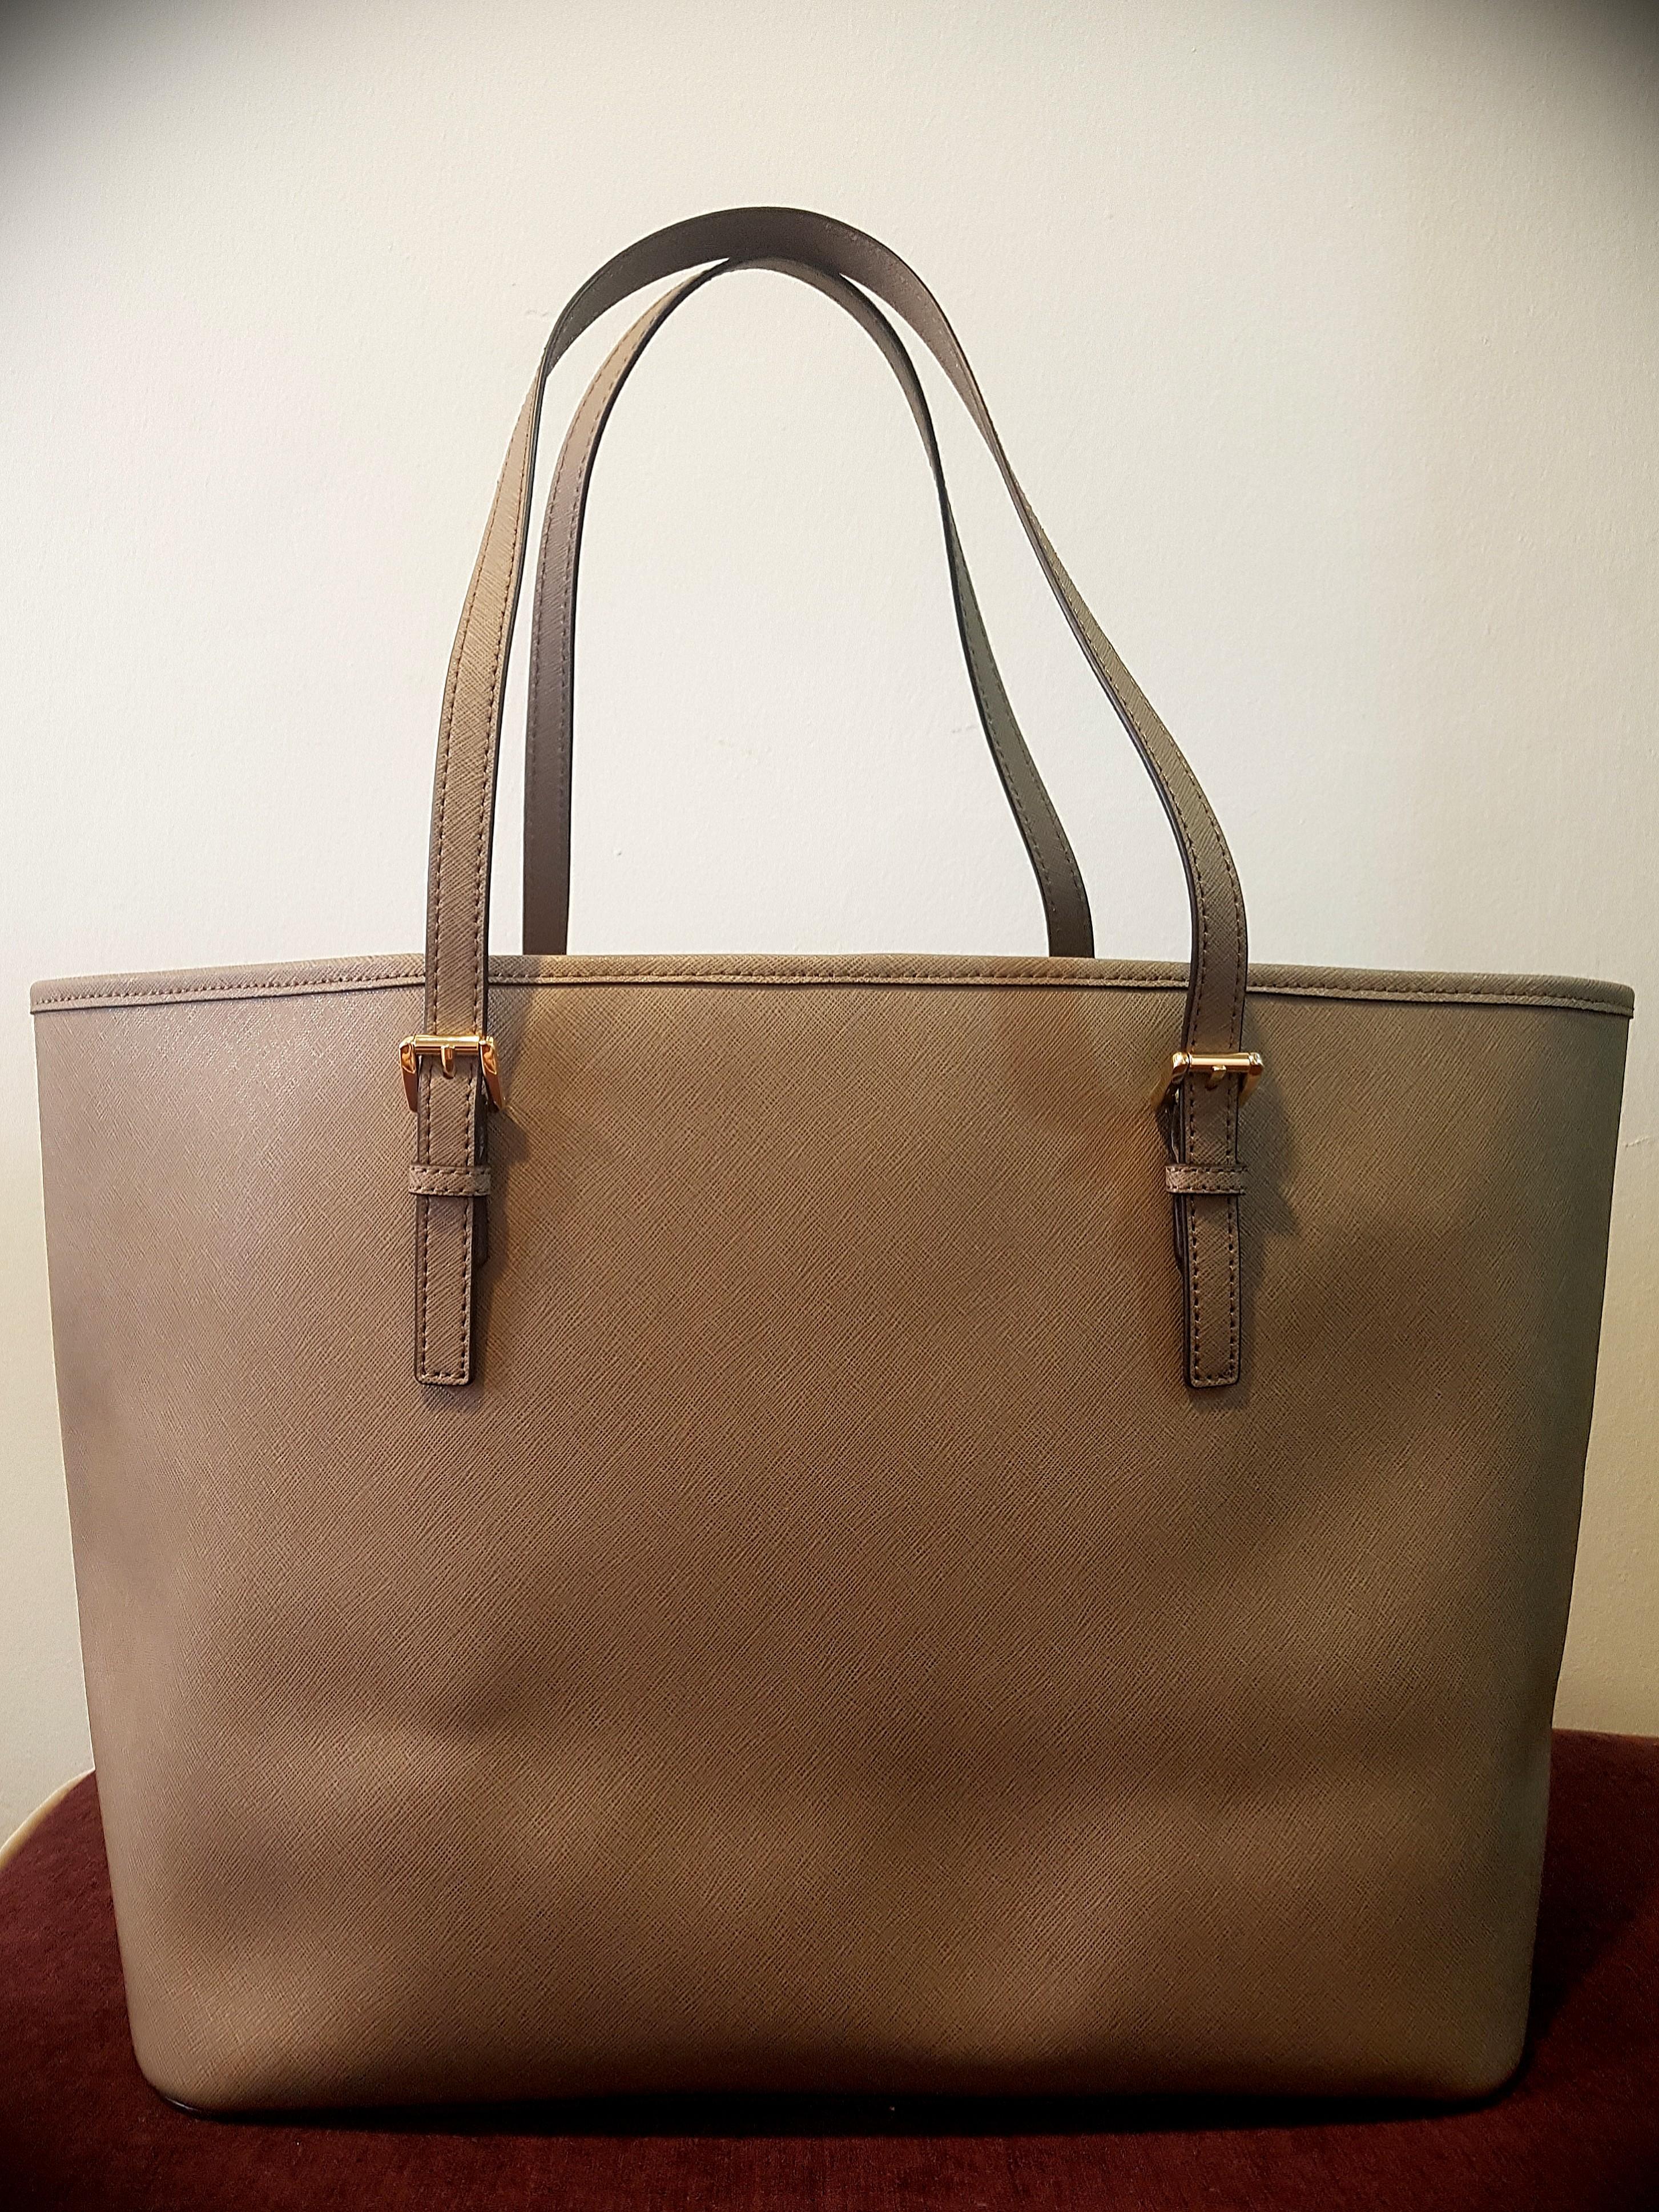 d565f2dff2fc Michael Kors Jet Set Travel Bag, Luxury, Bags & Wallets, Handbags on ...